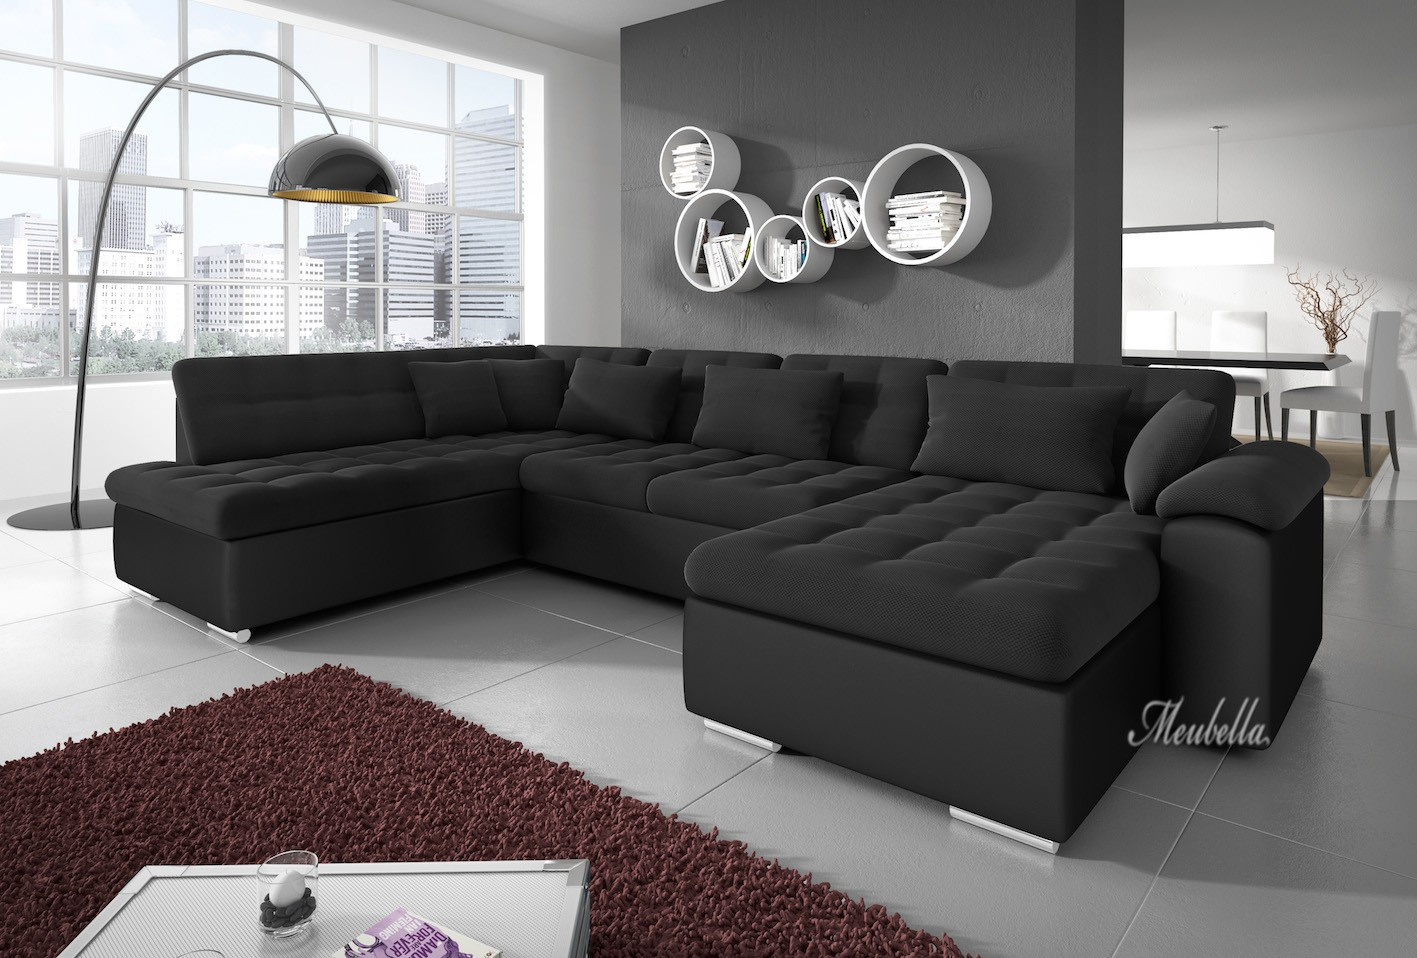 Woonkamer met lzwart leren hoekbank interieur meubilair idee n - Zwarte bank lounge ...